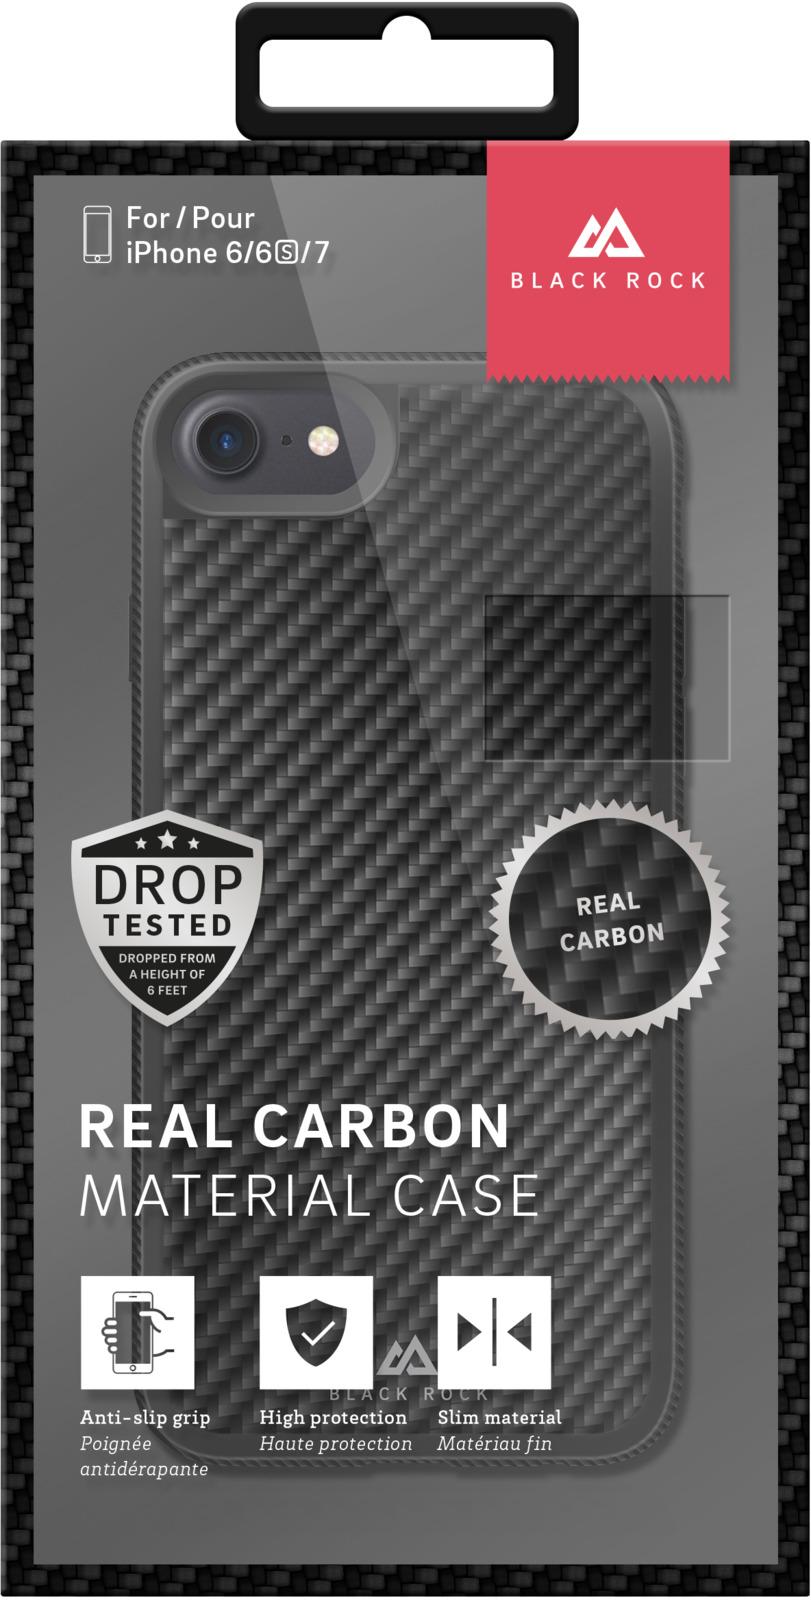 Чехол для Apple iPhone 6/6s, Apple iPhone 7, Apple iPhone 8 Material Case Real Carbon для iPhone 8 / 7 / 6/6S